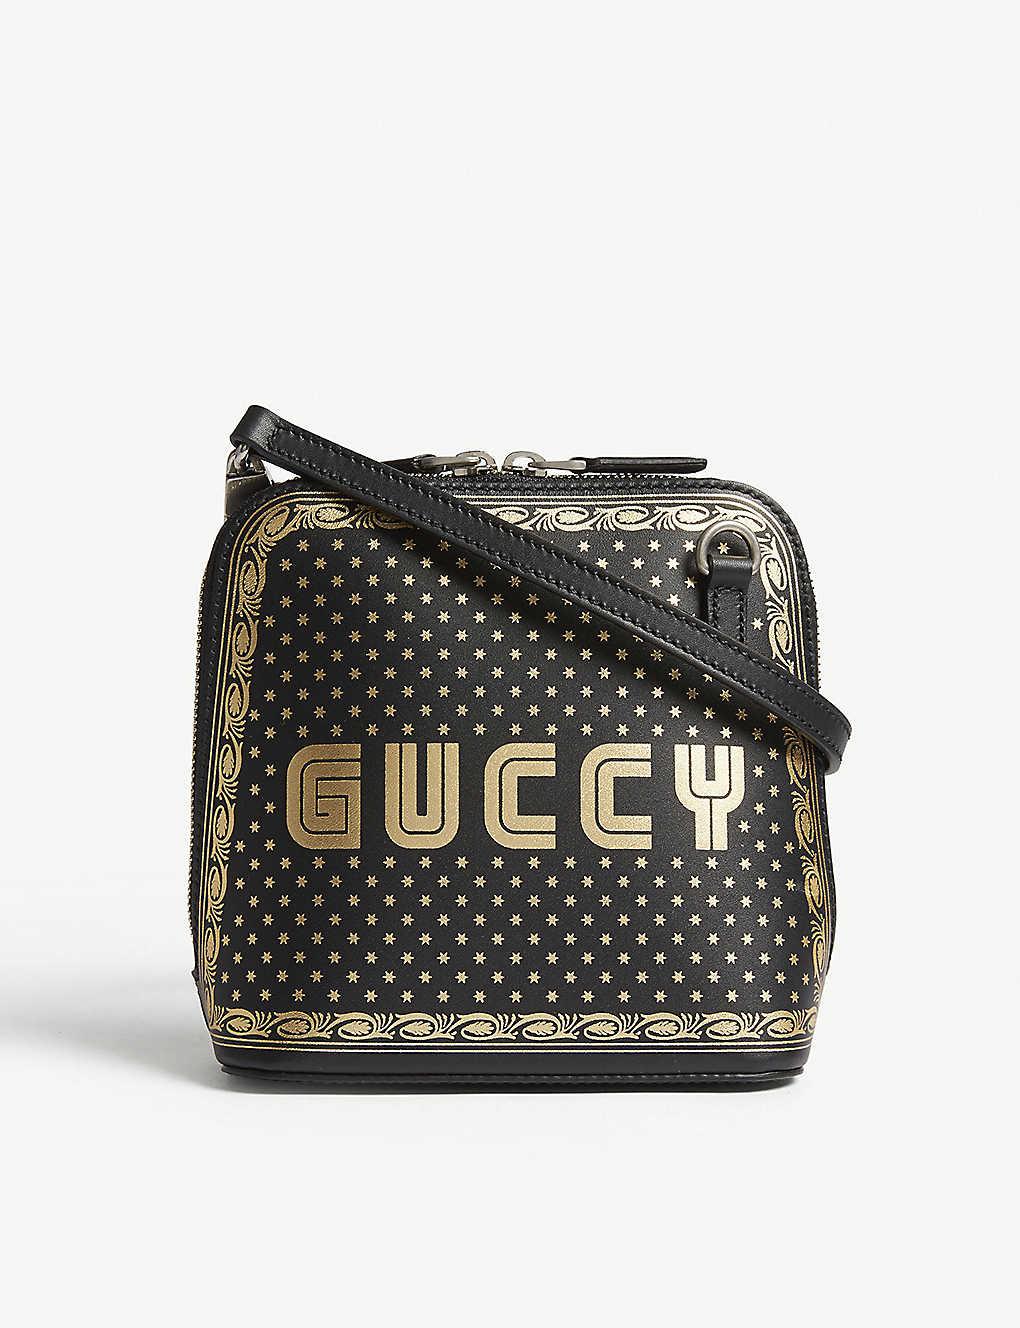 12f3a3c3ebe GUCCI - Guccy mini leather shoulder bag